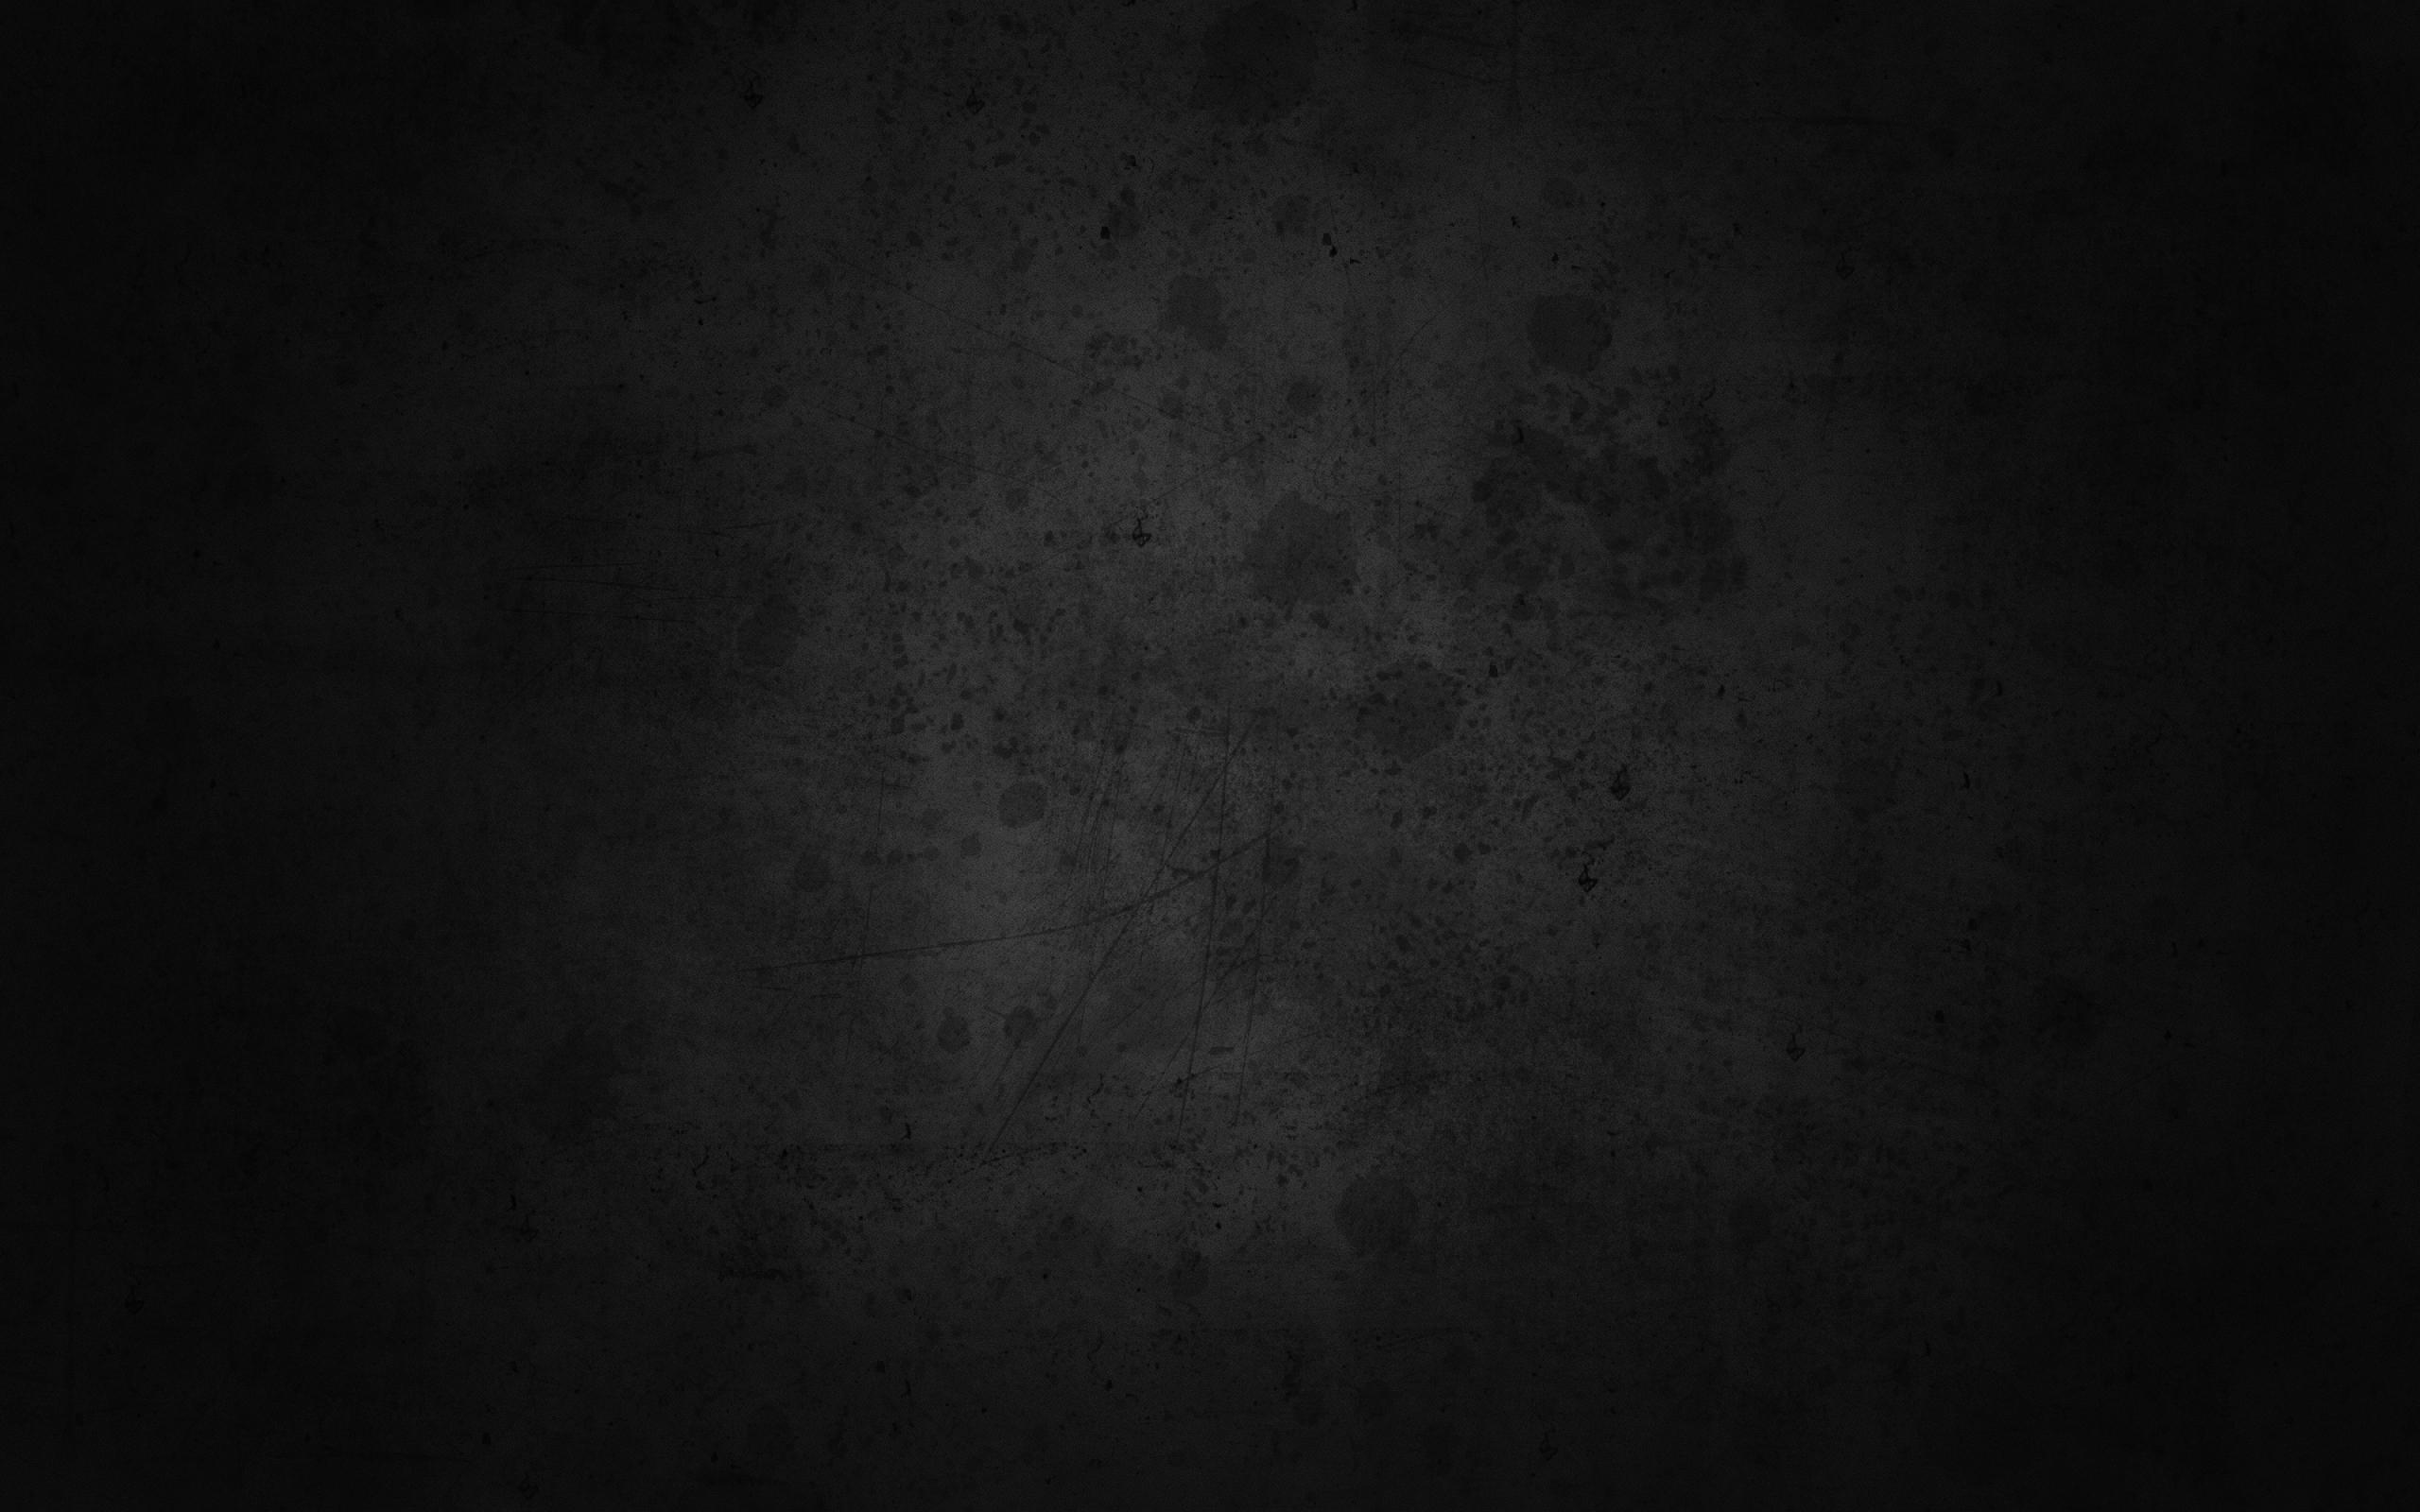 black-plain-wallpaper